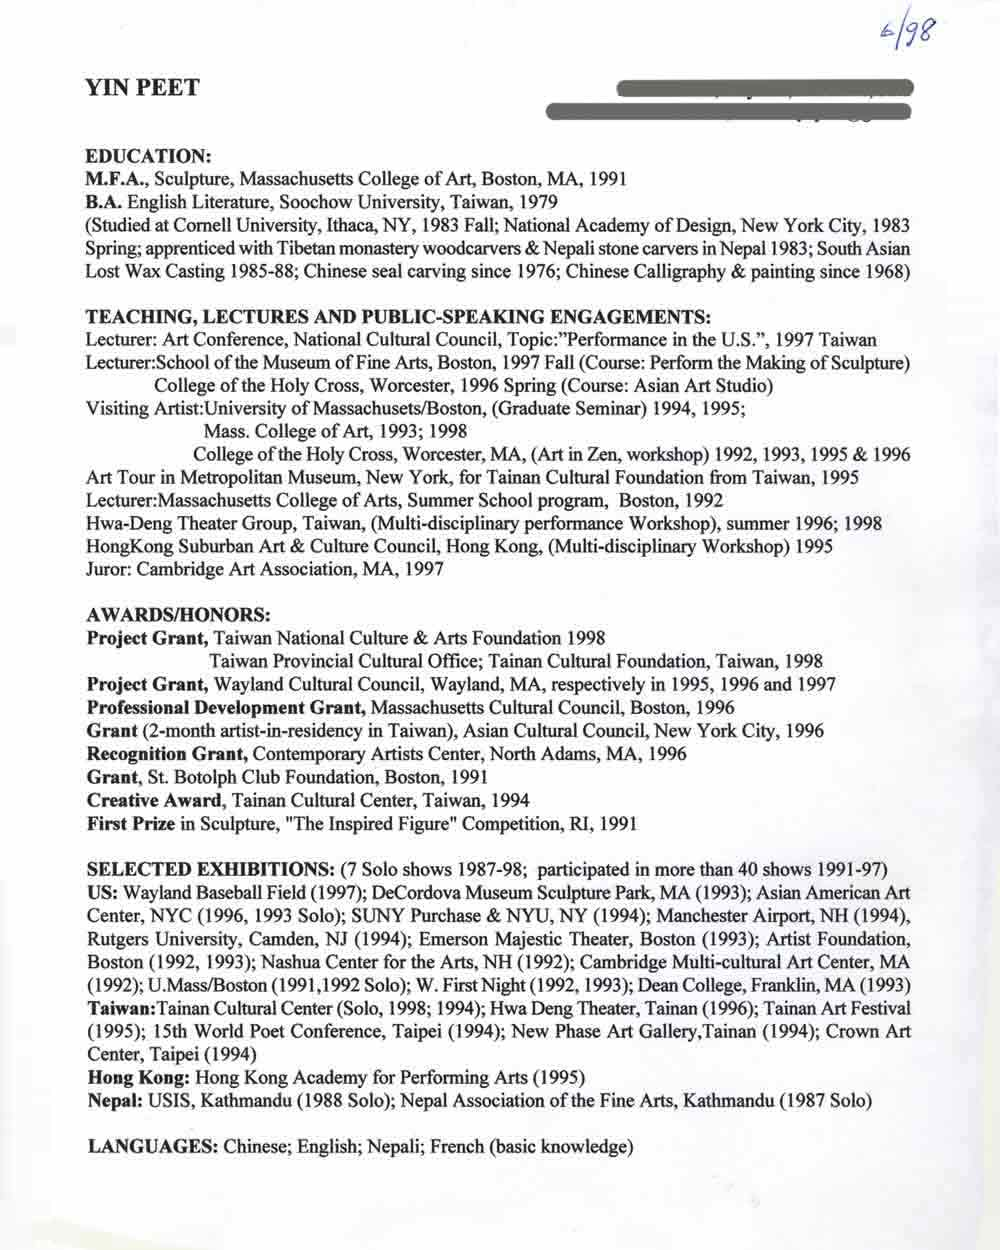 Yin Peet's Resume